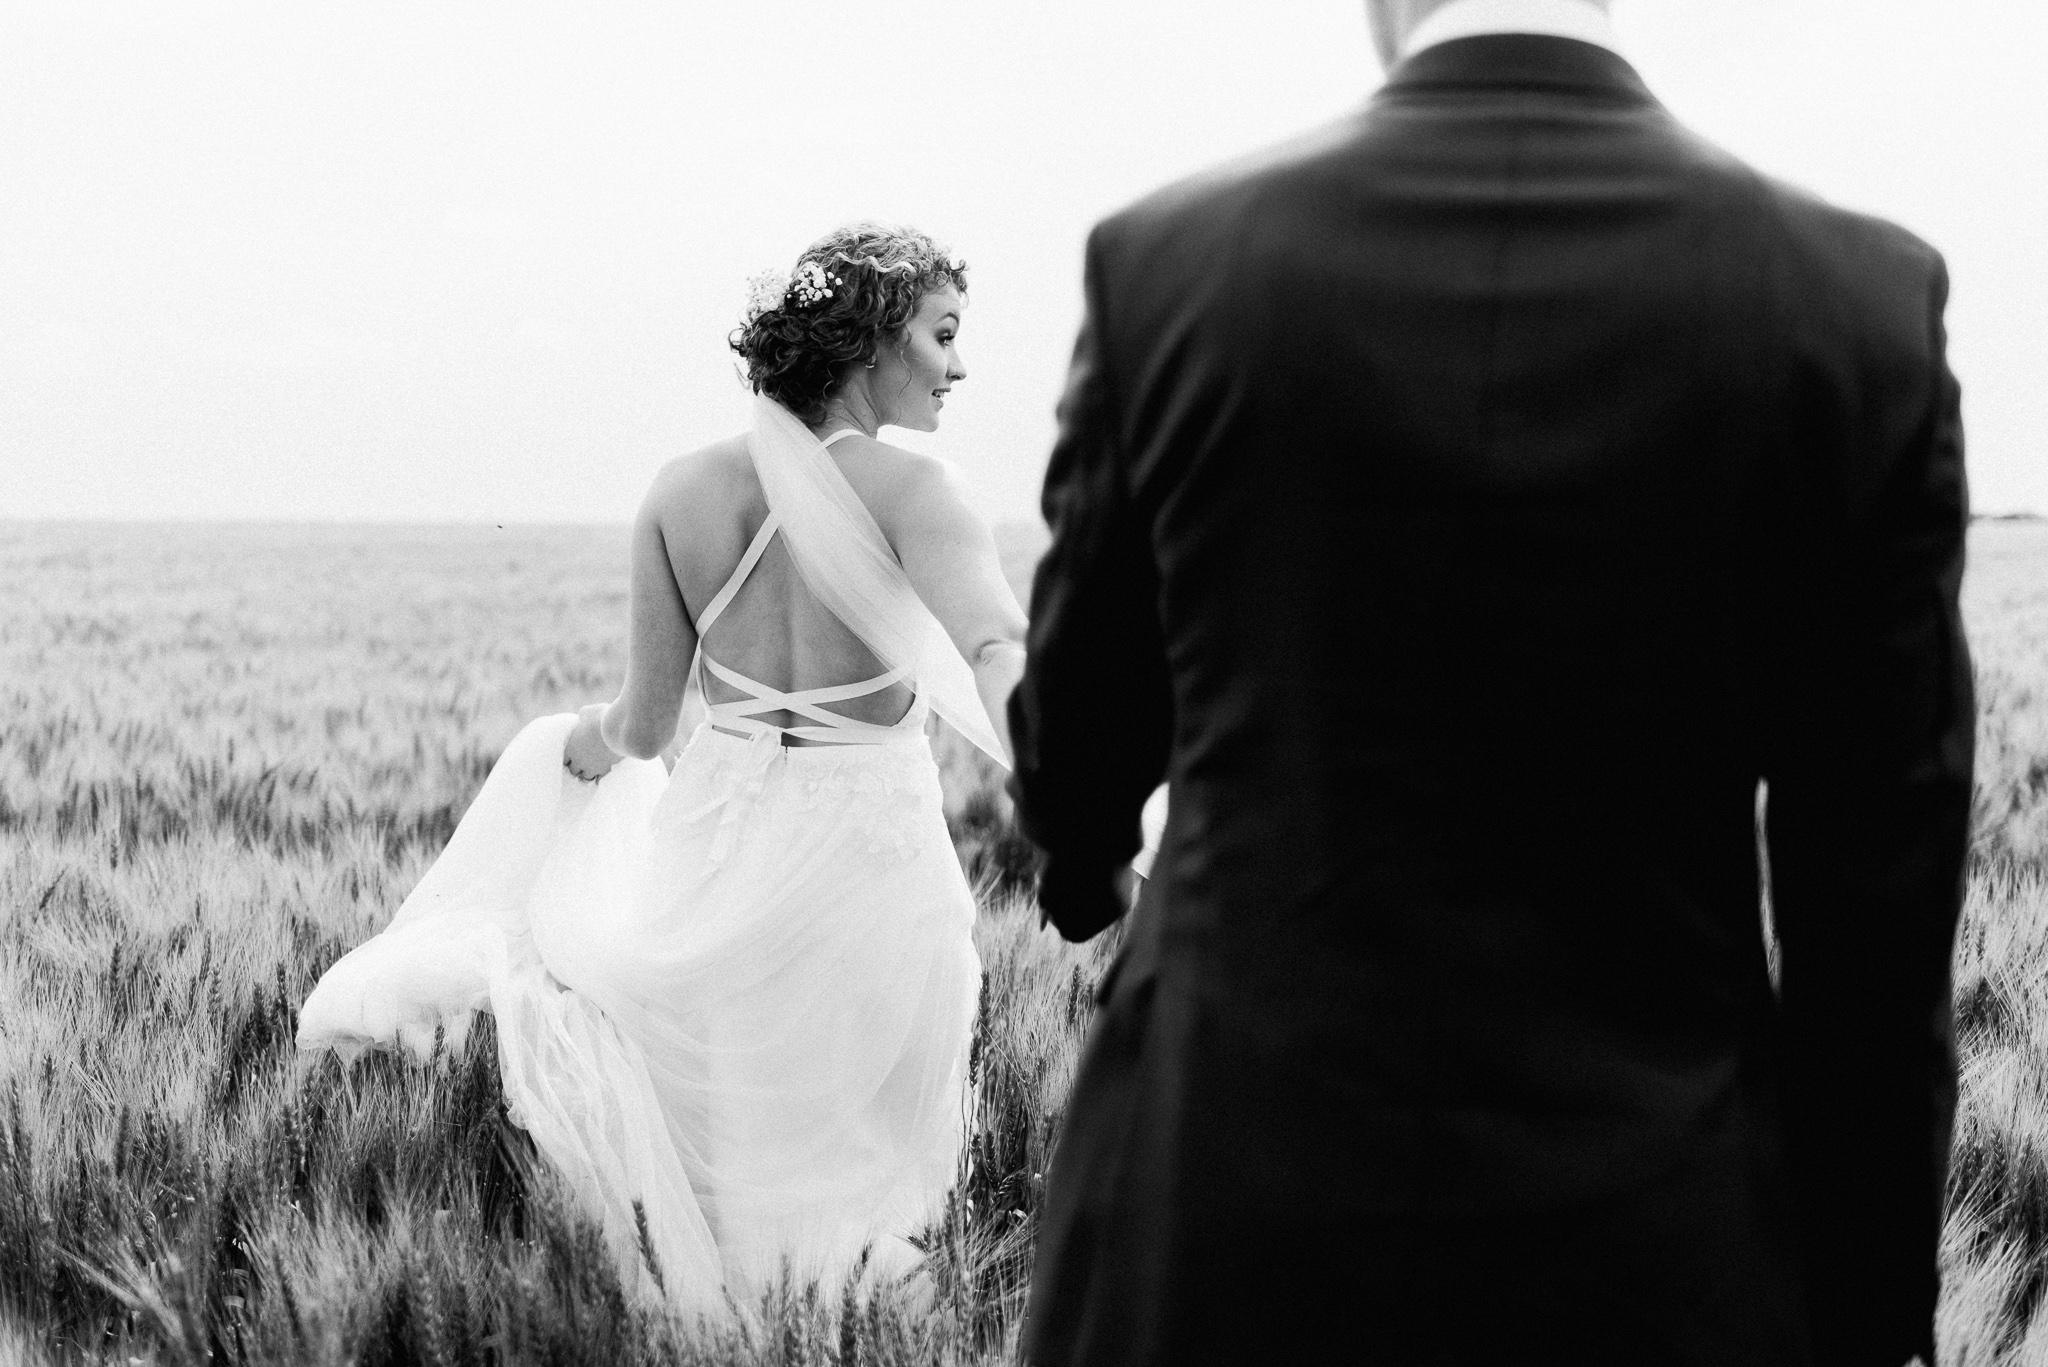 J&C-Weddingblog-74.jpg